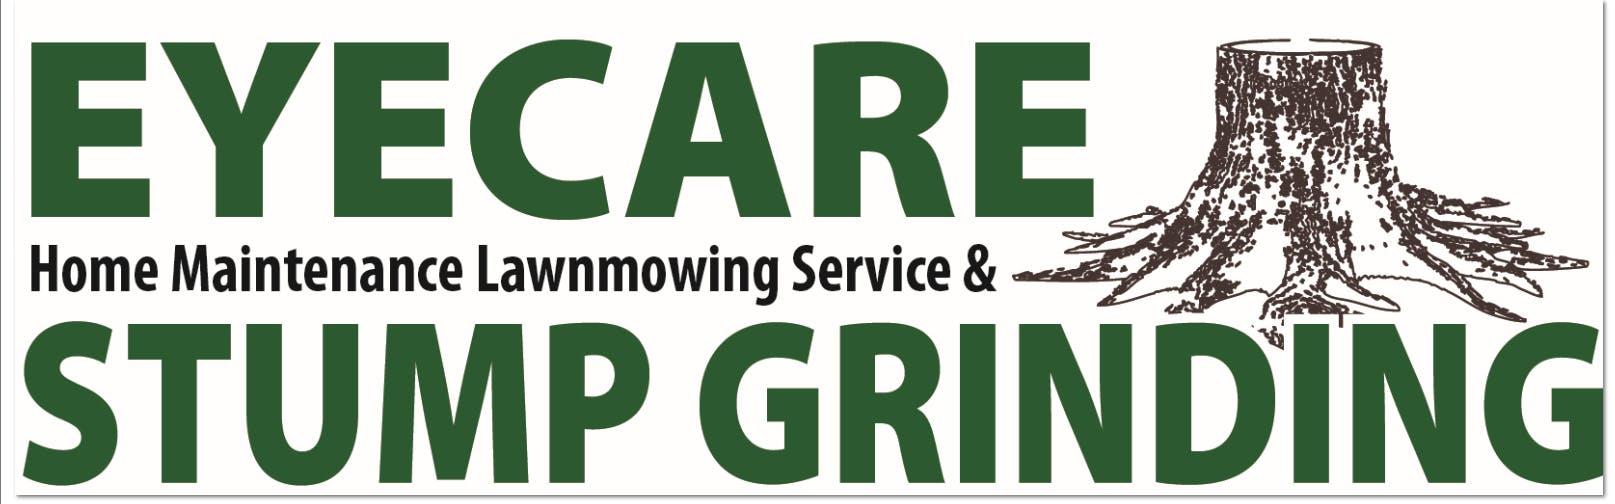 Eyecare Home Maintenance & Lawn-mowing